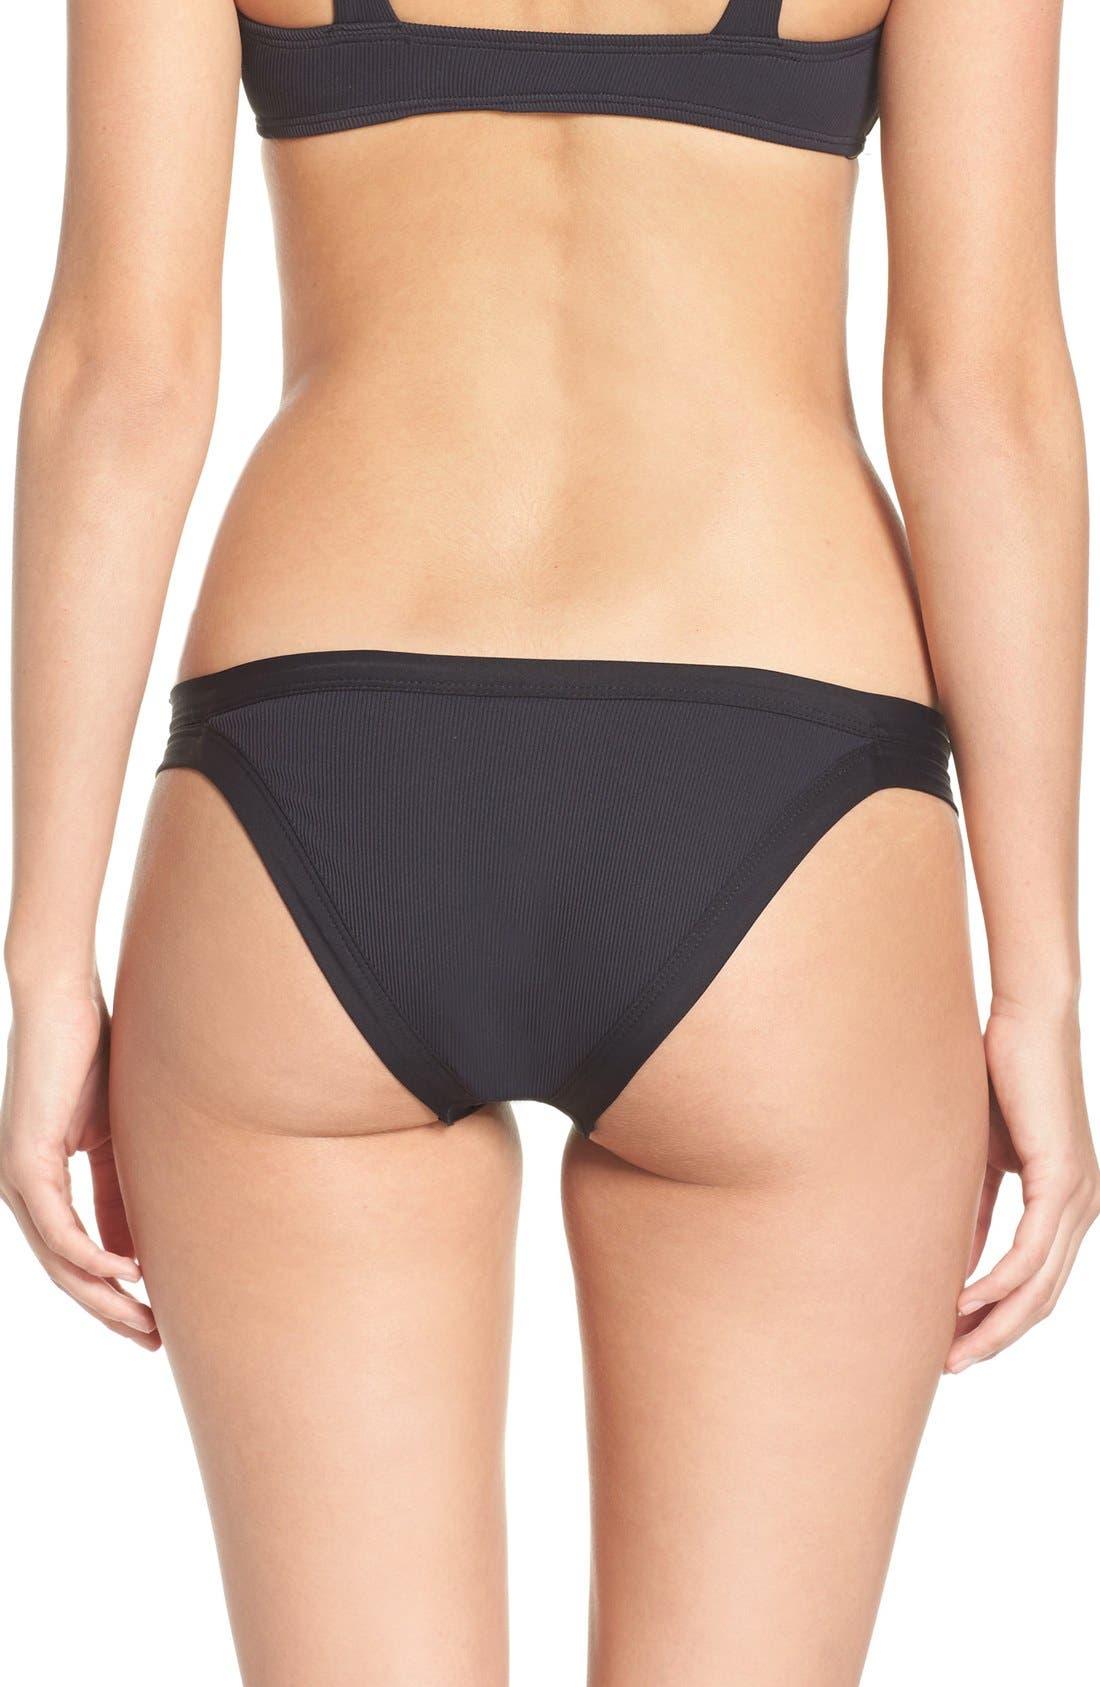 Ridin' High Charlie Classic Bikini Bottoms,                             Main thumbnail 3, color,